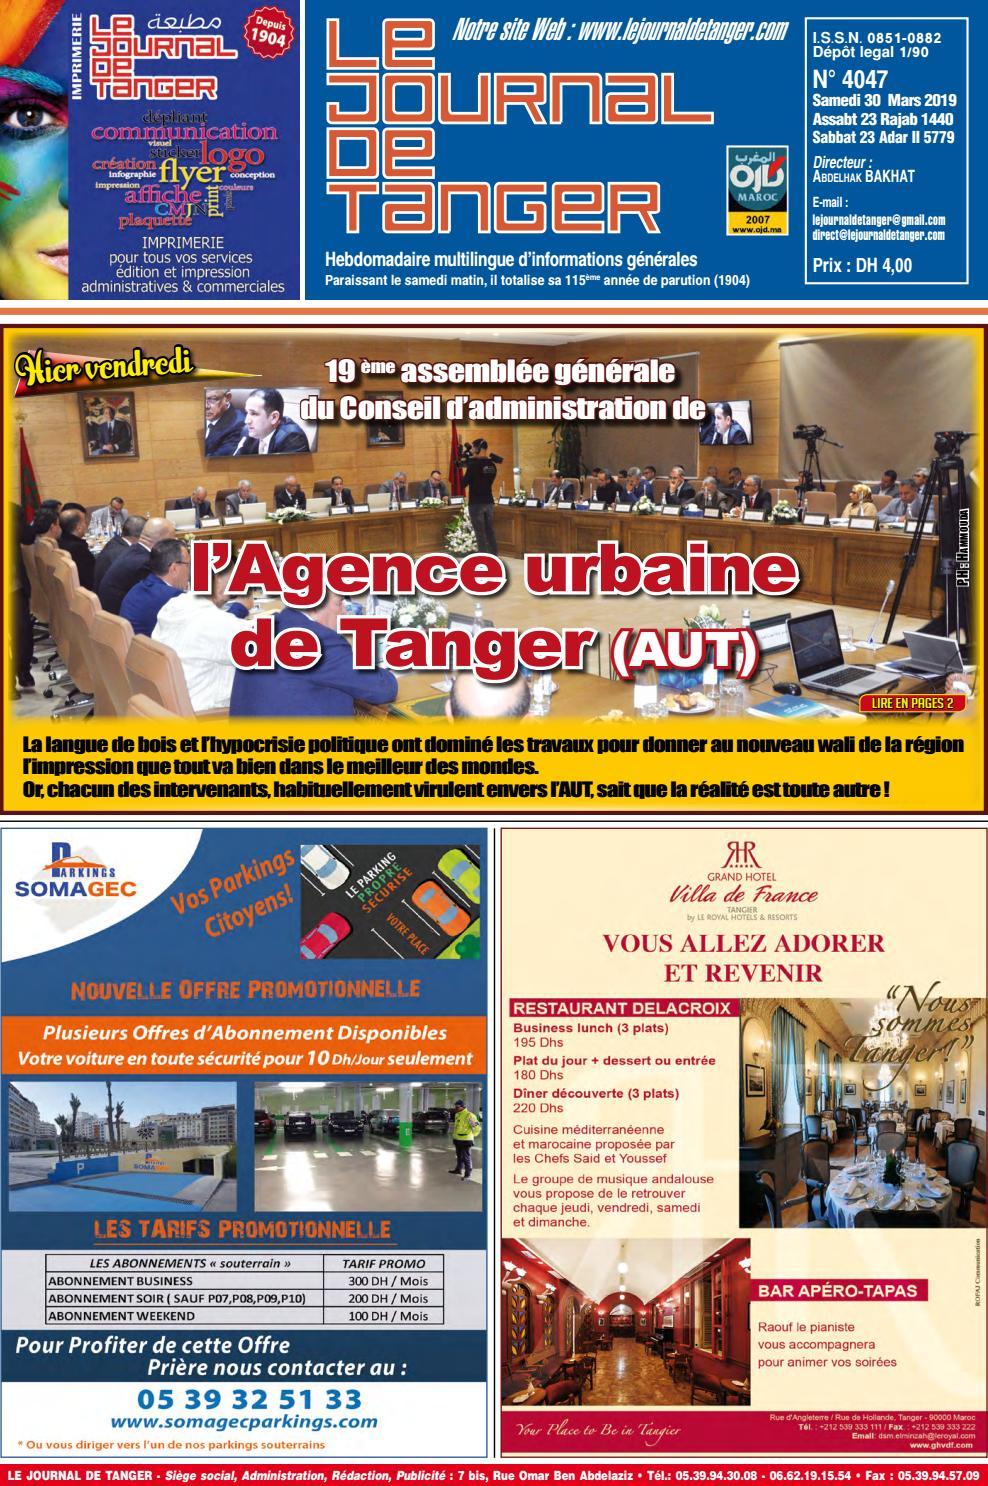 0ef7a4361 Le journal de Tanger 30 Mars 2019 by Le Journal de Tanger - issuu